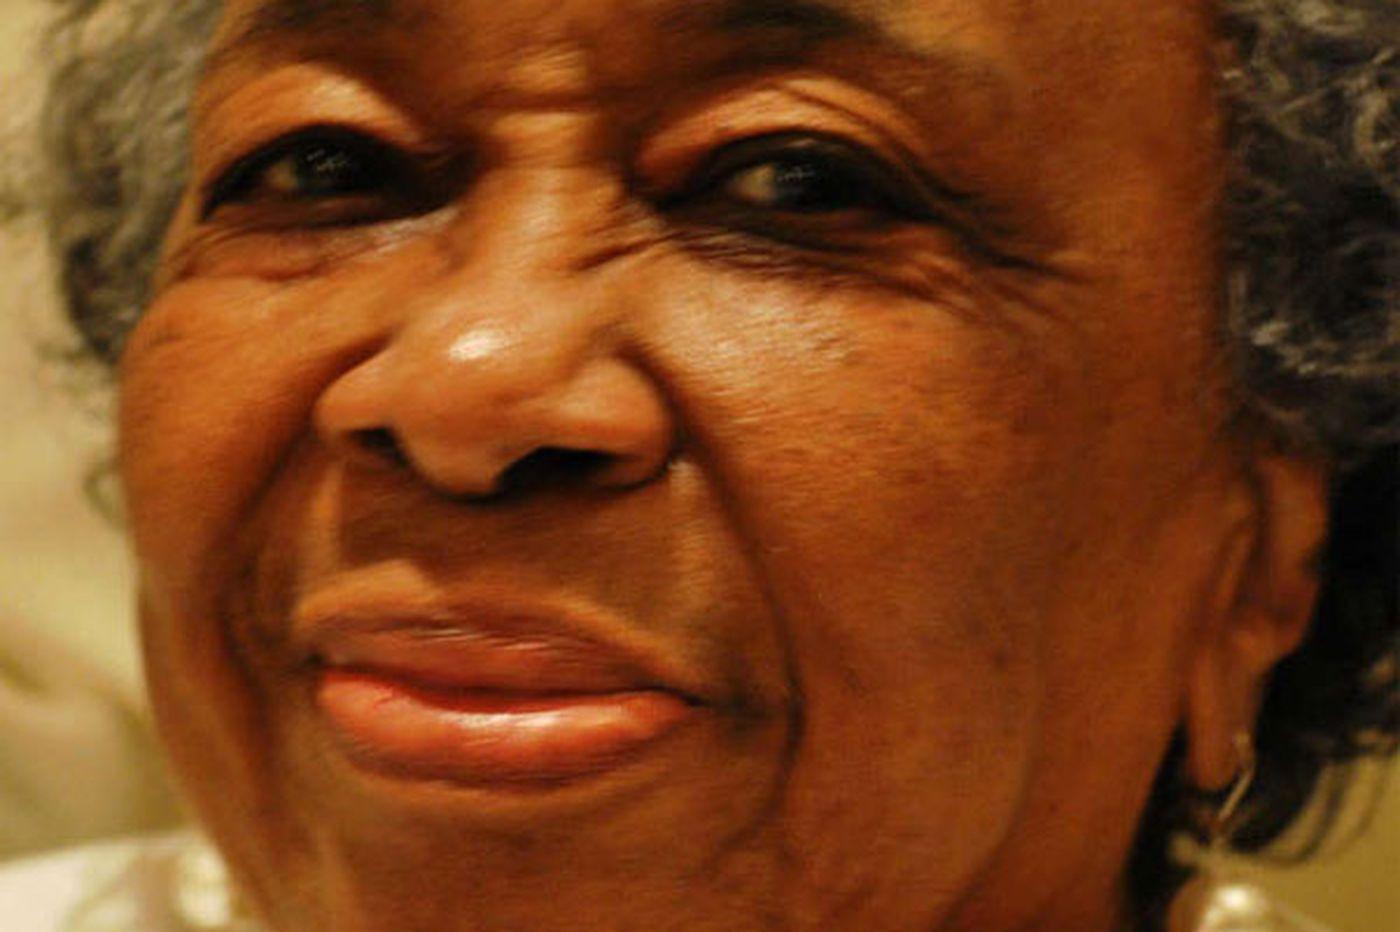 Naomi Jaudon Small, 79, taught at Youth Study Center